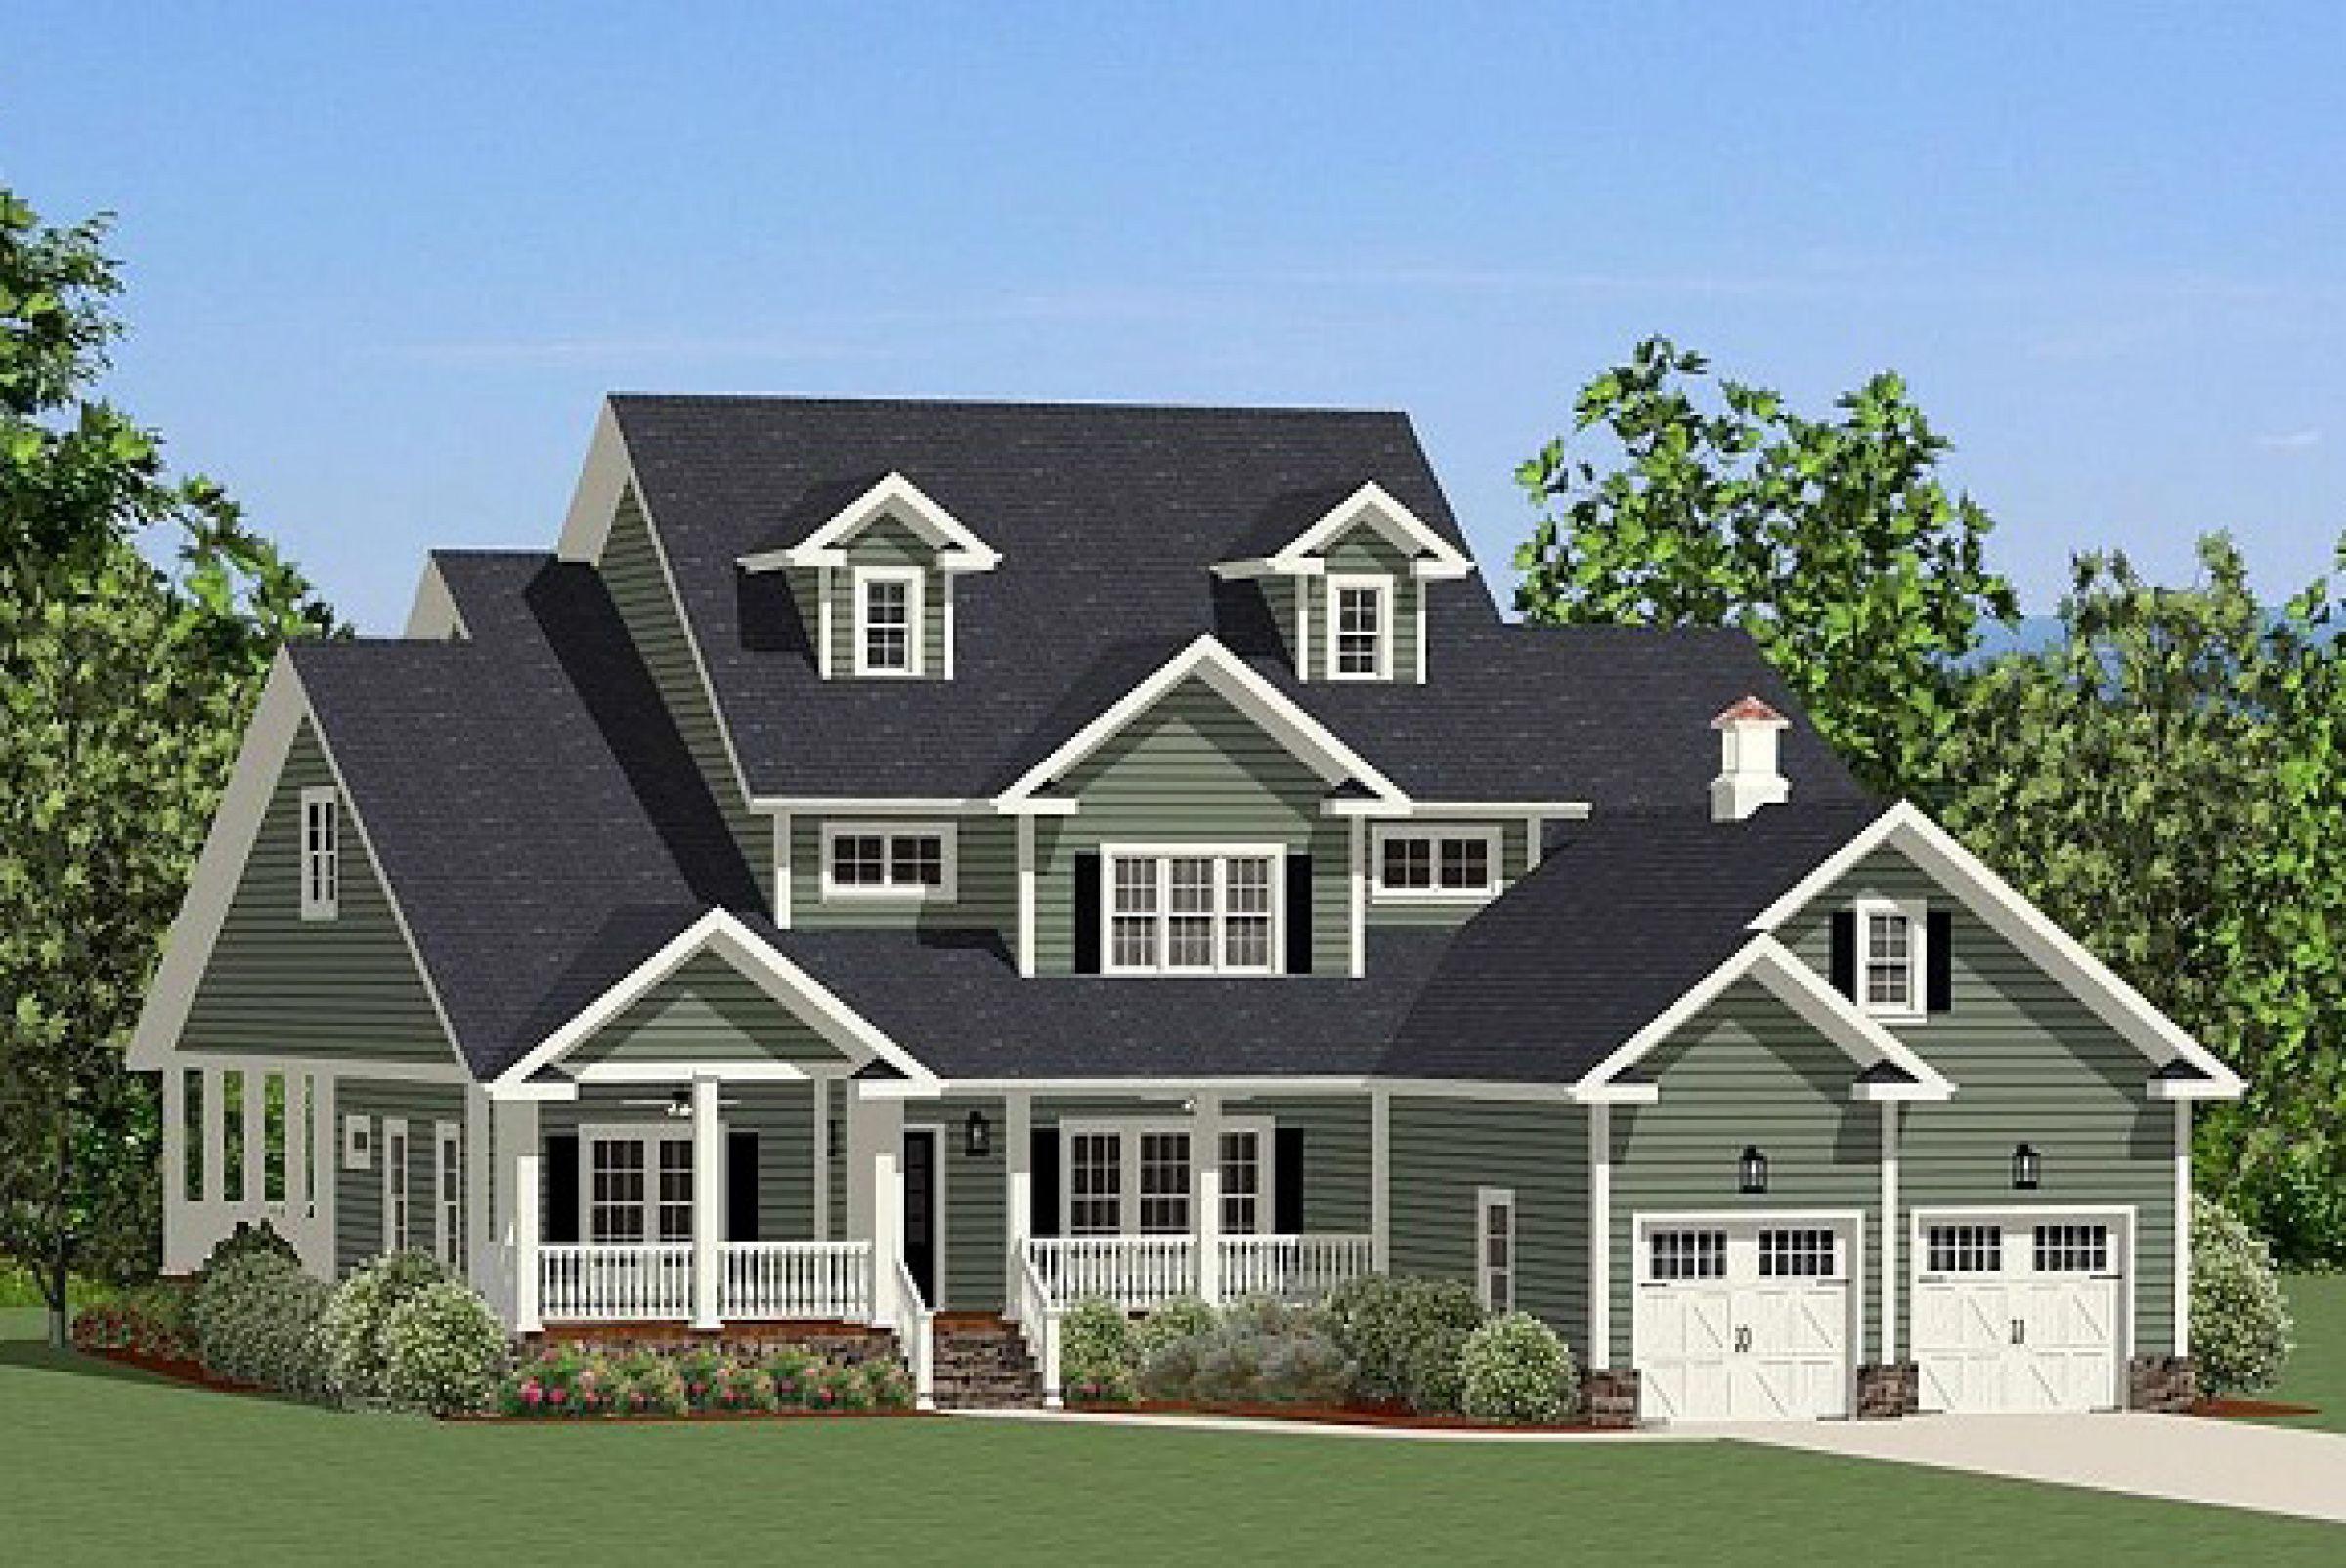 Plan 46256LA Traditional House Plan with WrapAround